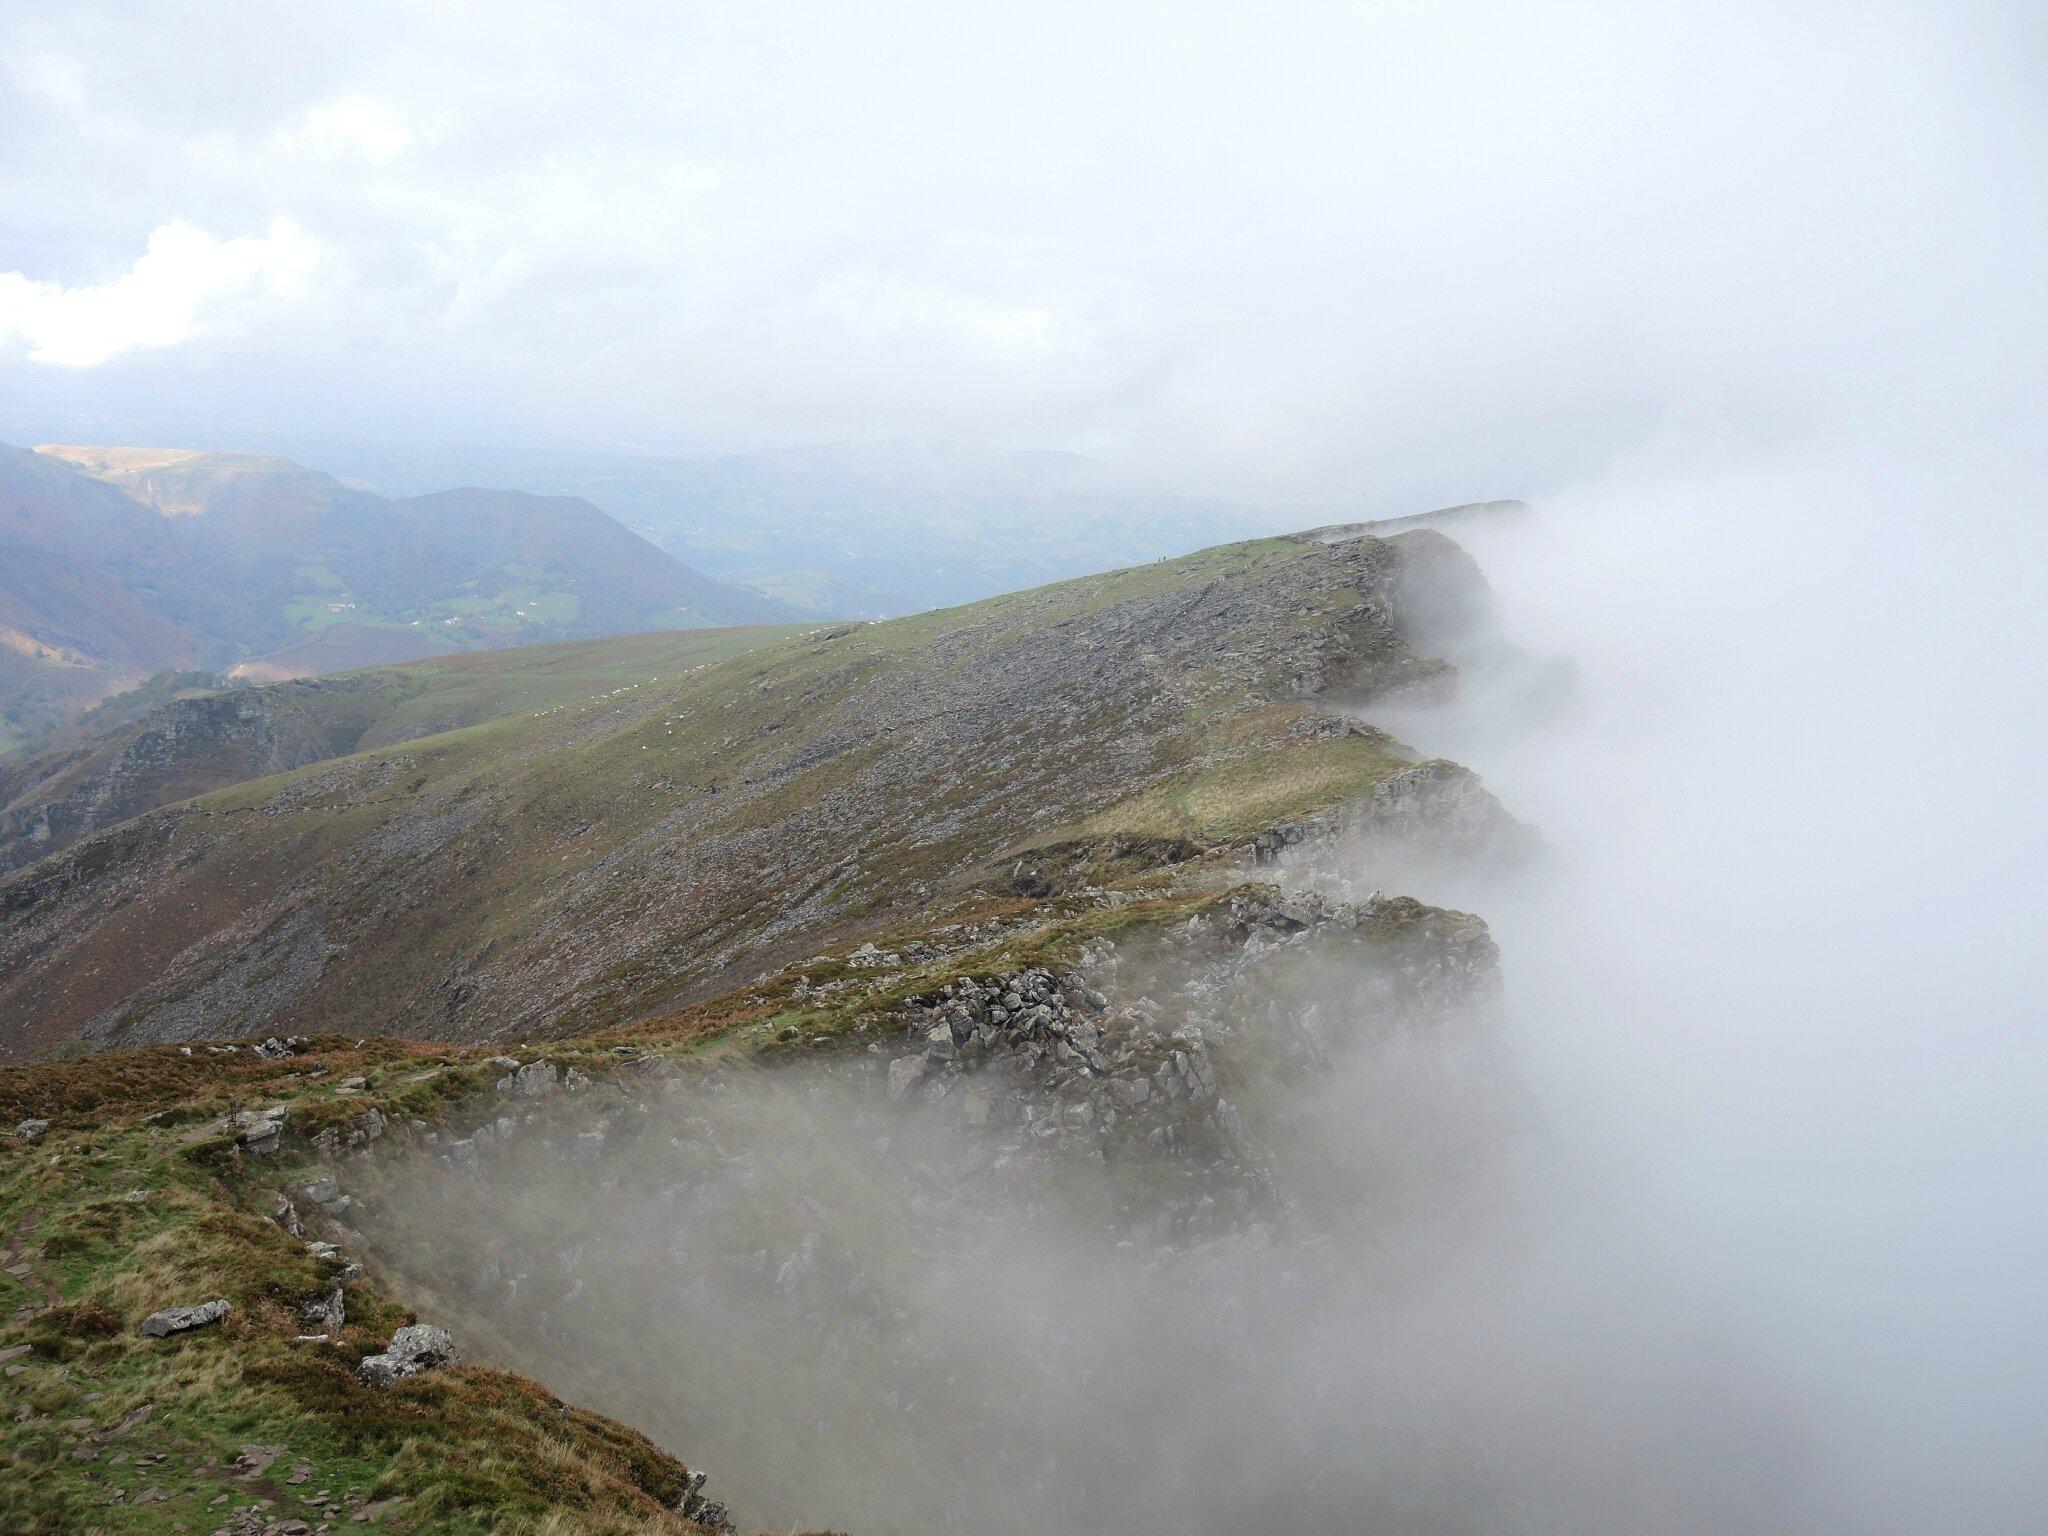 Bidarray, Iparla, crètes et brouillard (64)